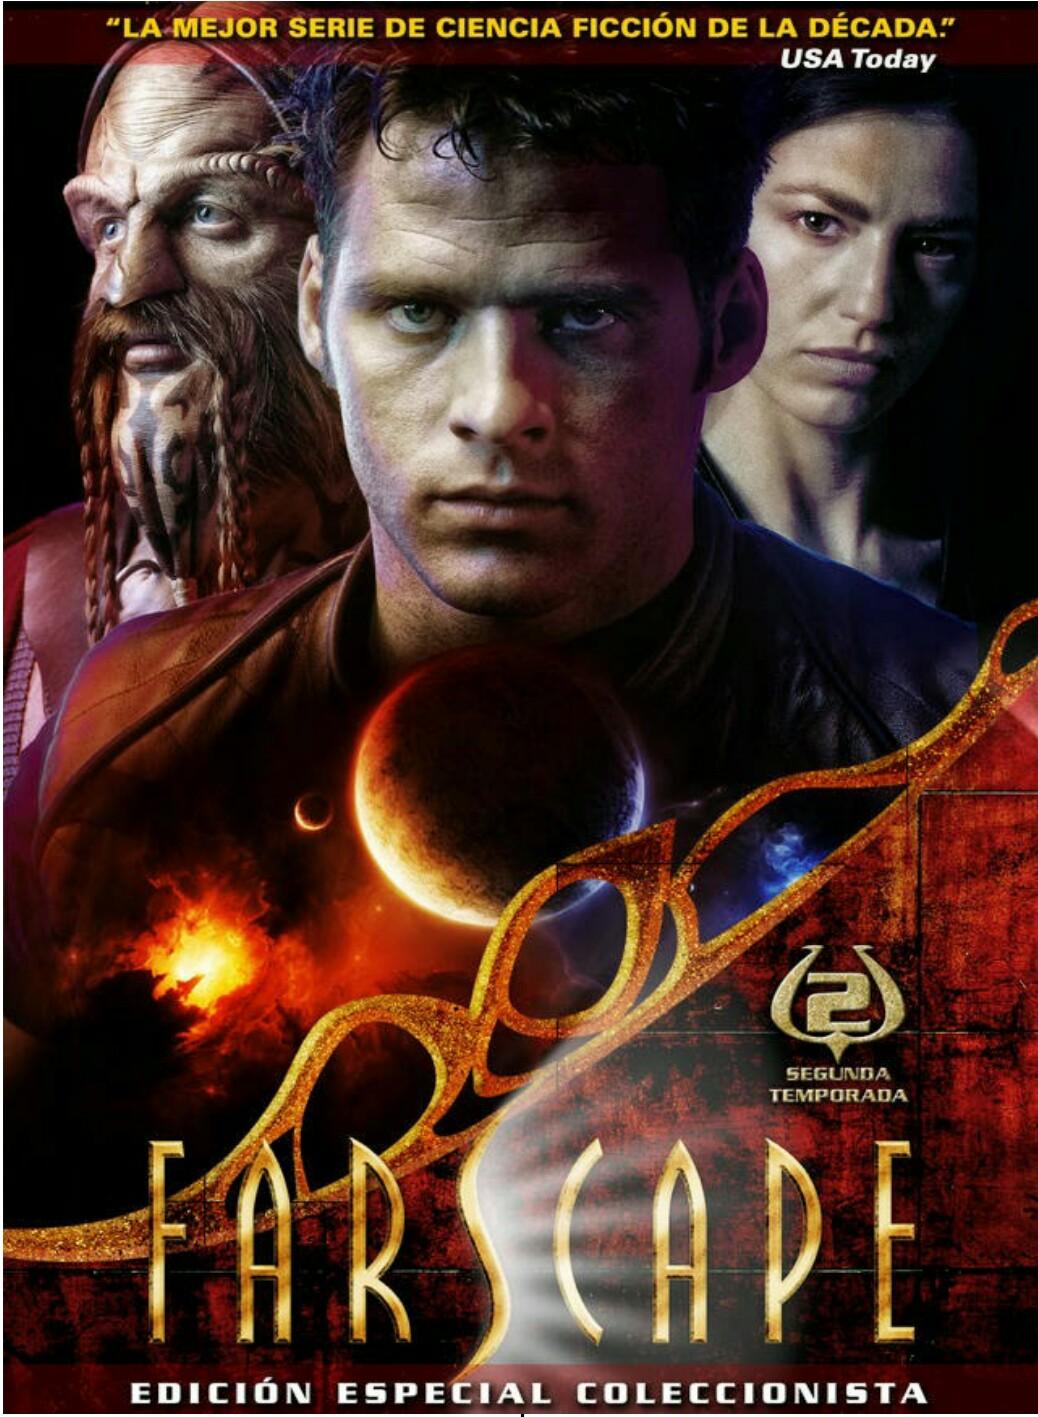 Farscape Temporada 2 WEB DL 720p Dual Latino/Ingles